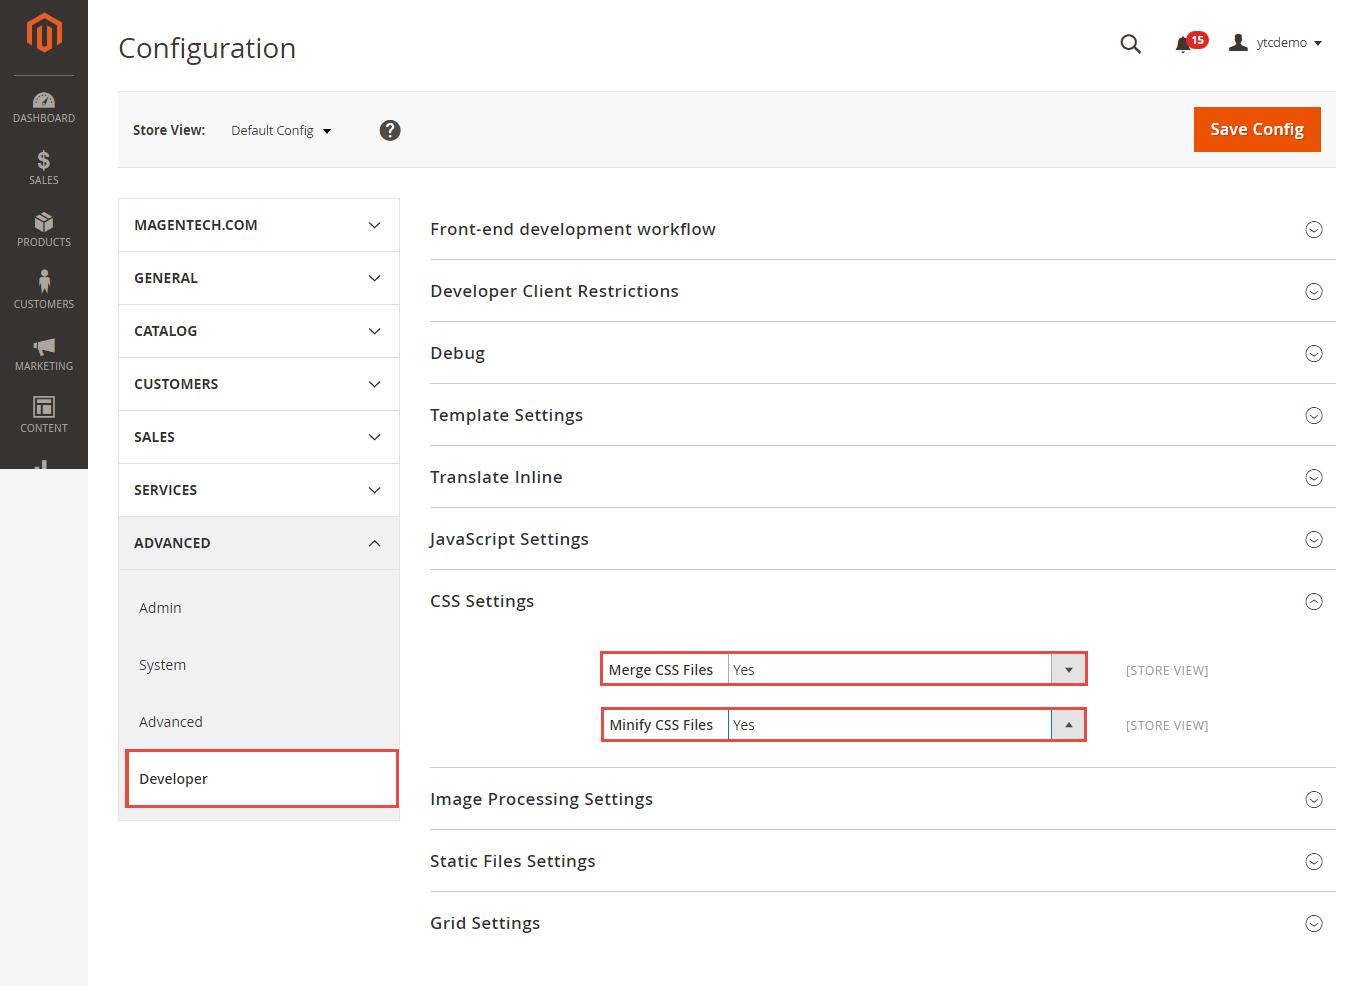 Enabling Flat categories in Magento 2